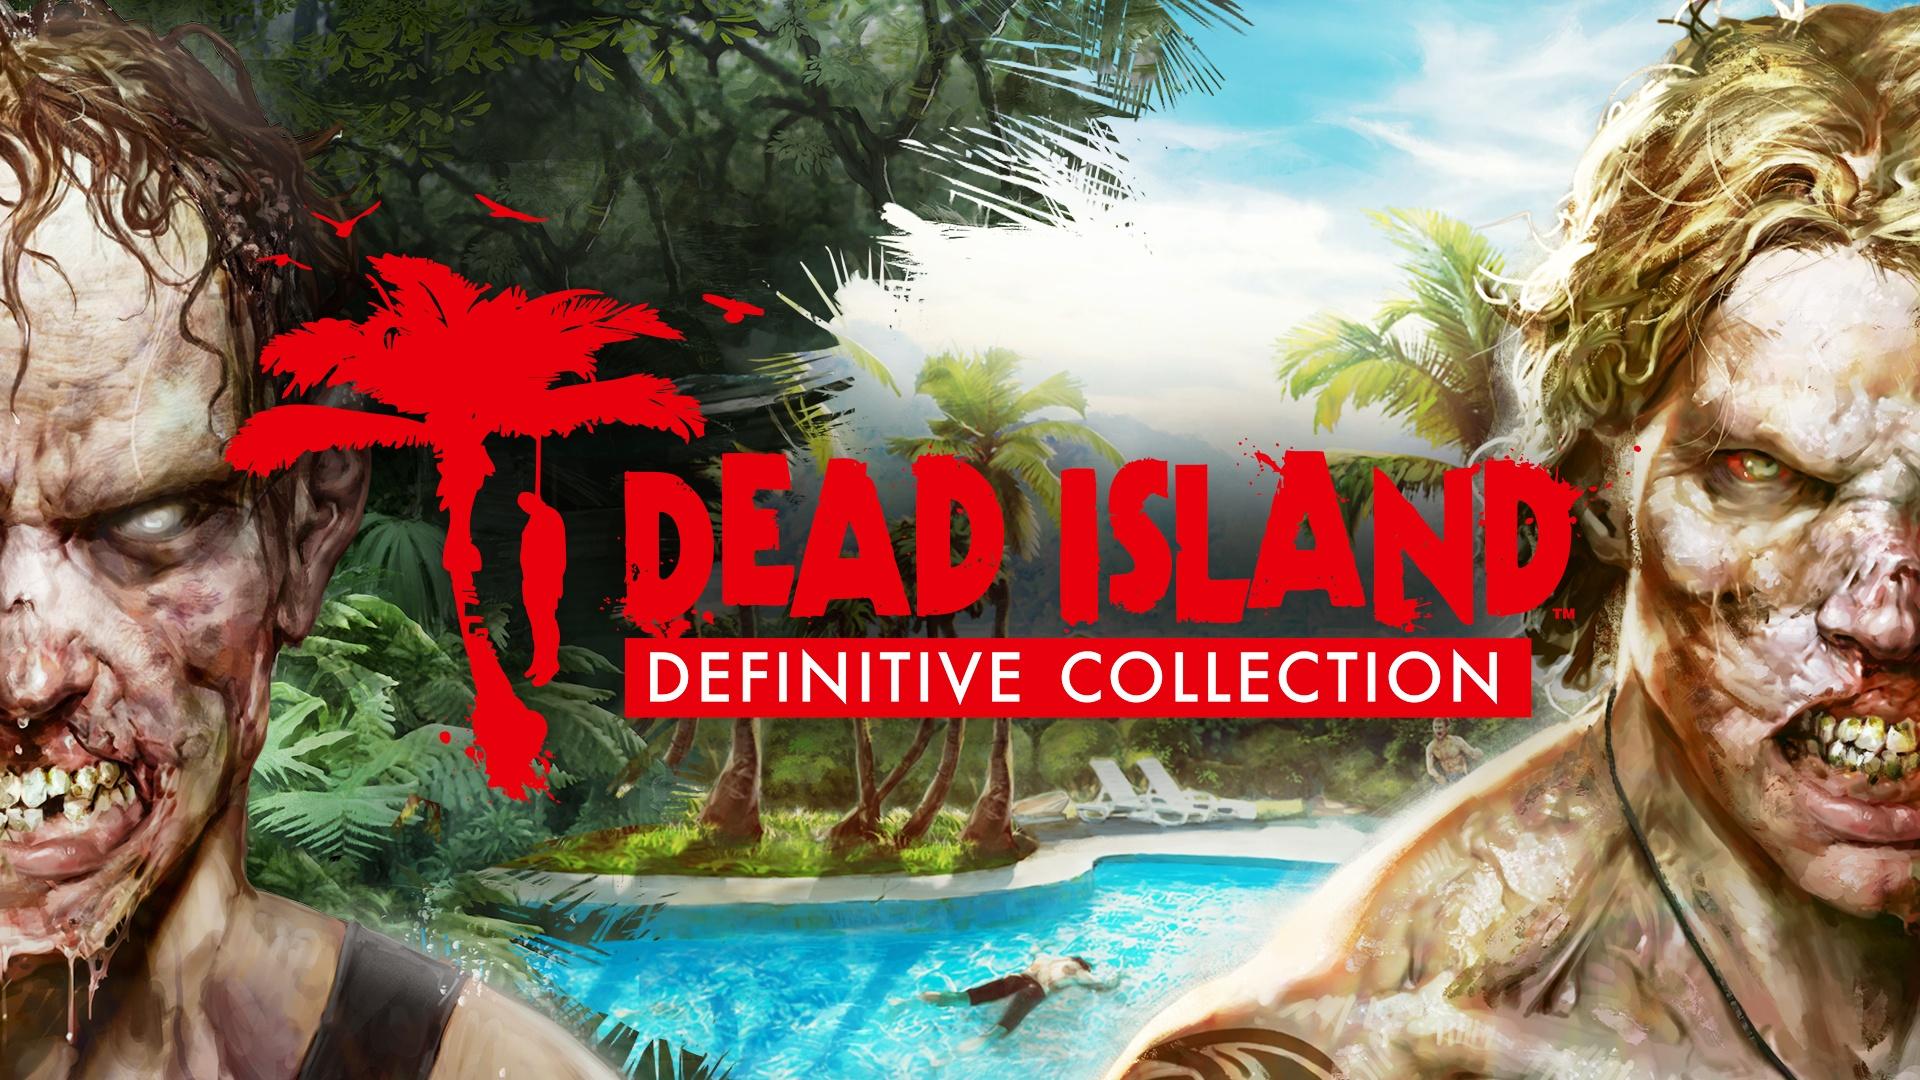 Dead Island Definitive Collection | Steam Game Bundle | Fanatical